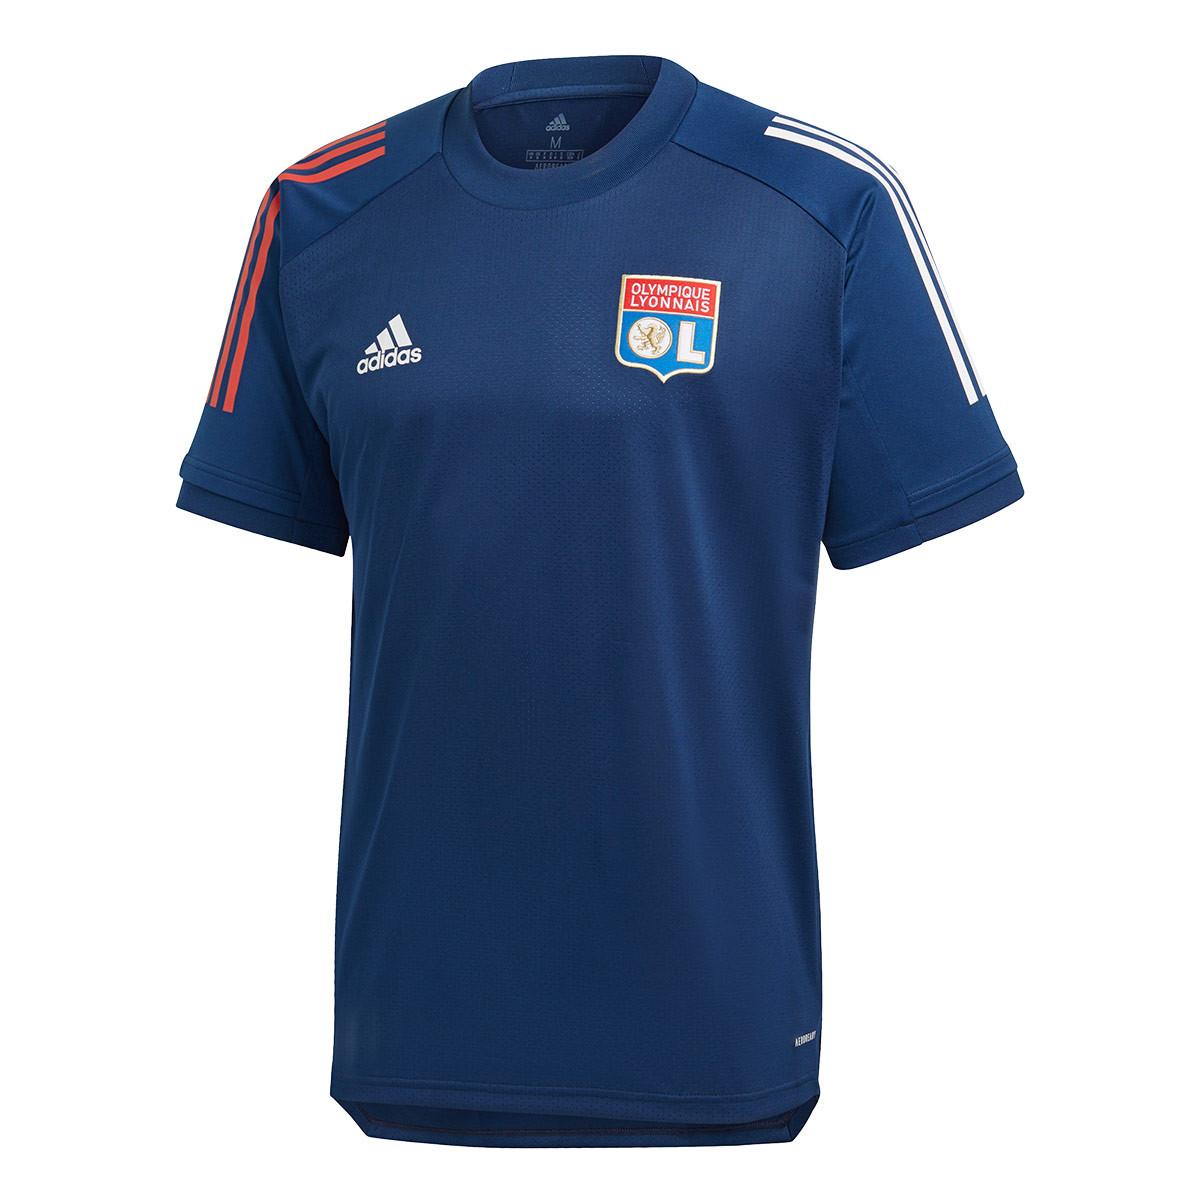 Constitución arroz Girar  Jersey adidas Olympique Lyon Training 2020-2021 Mystery blue - Football  store Fútbol Emotion